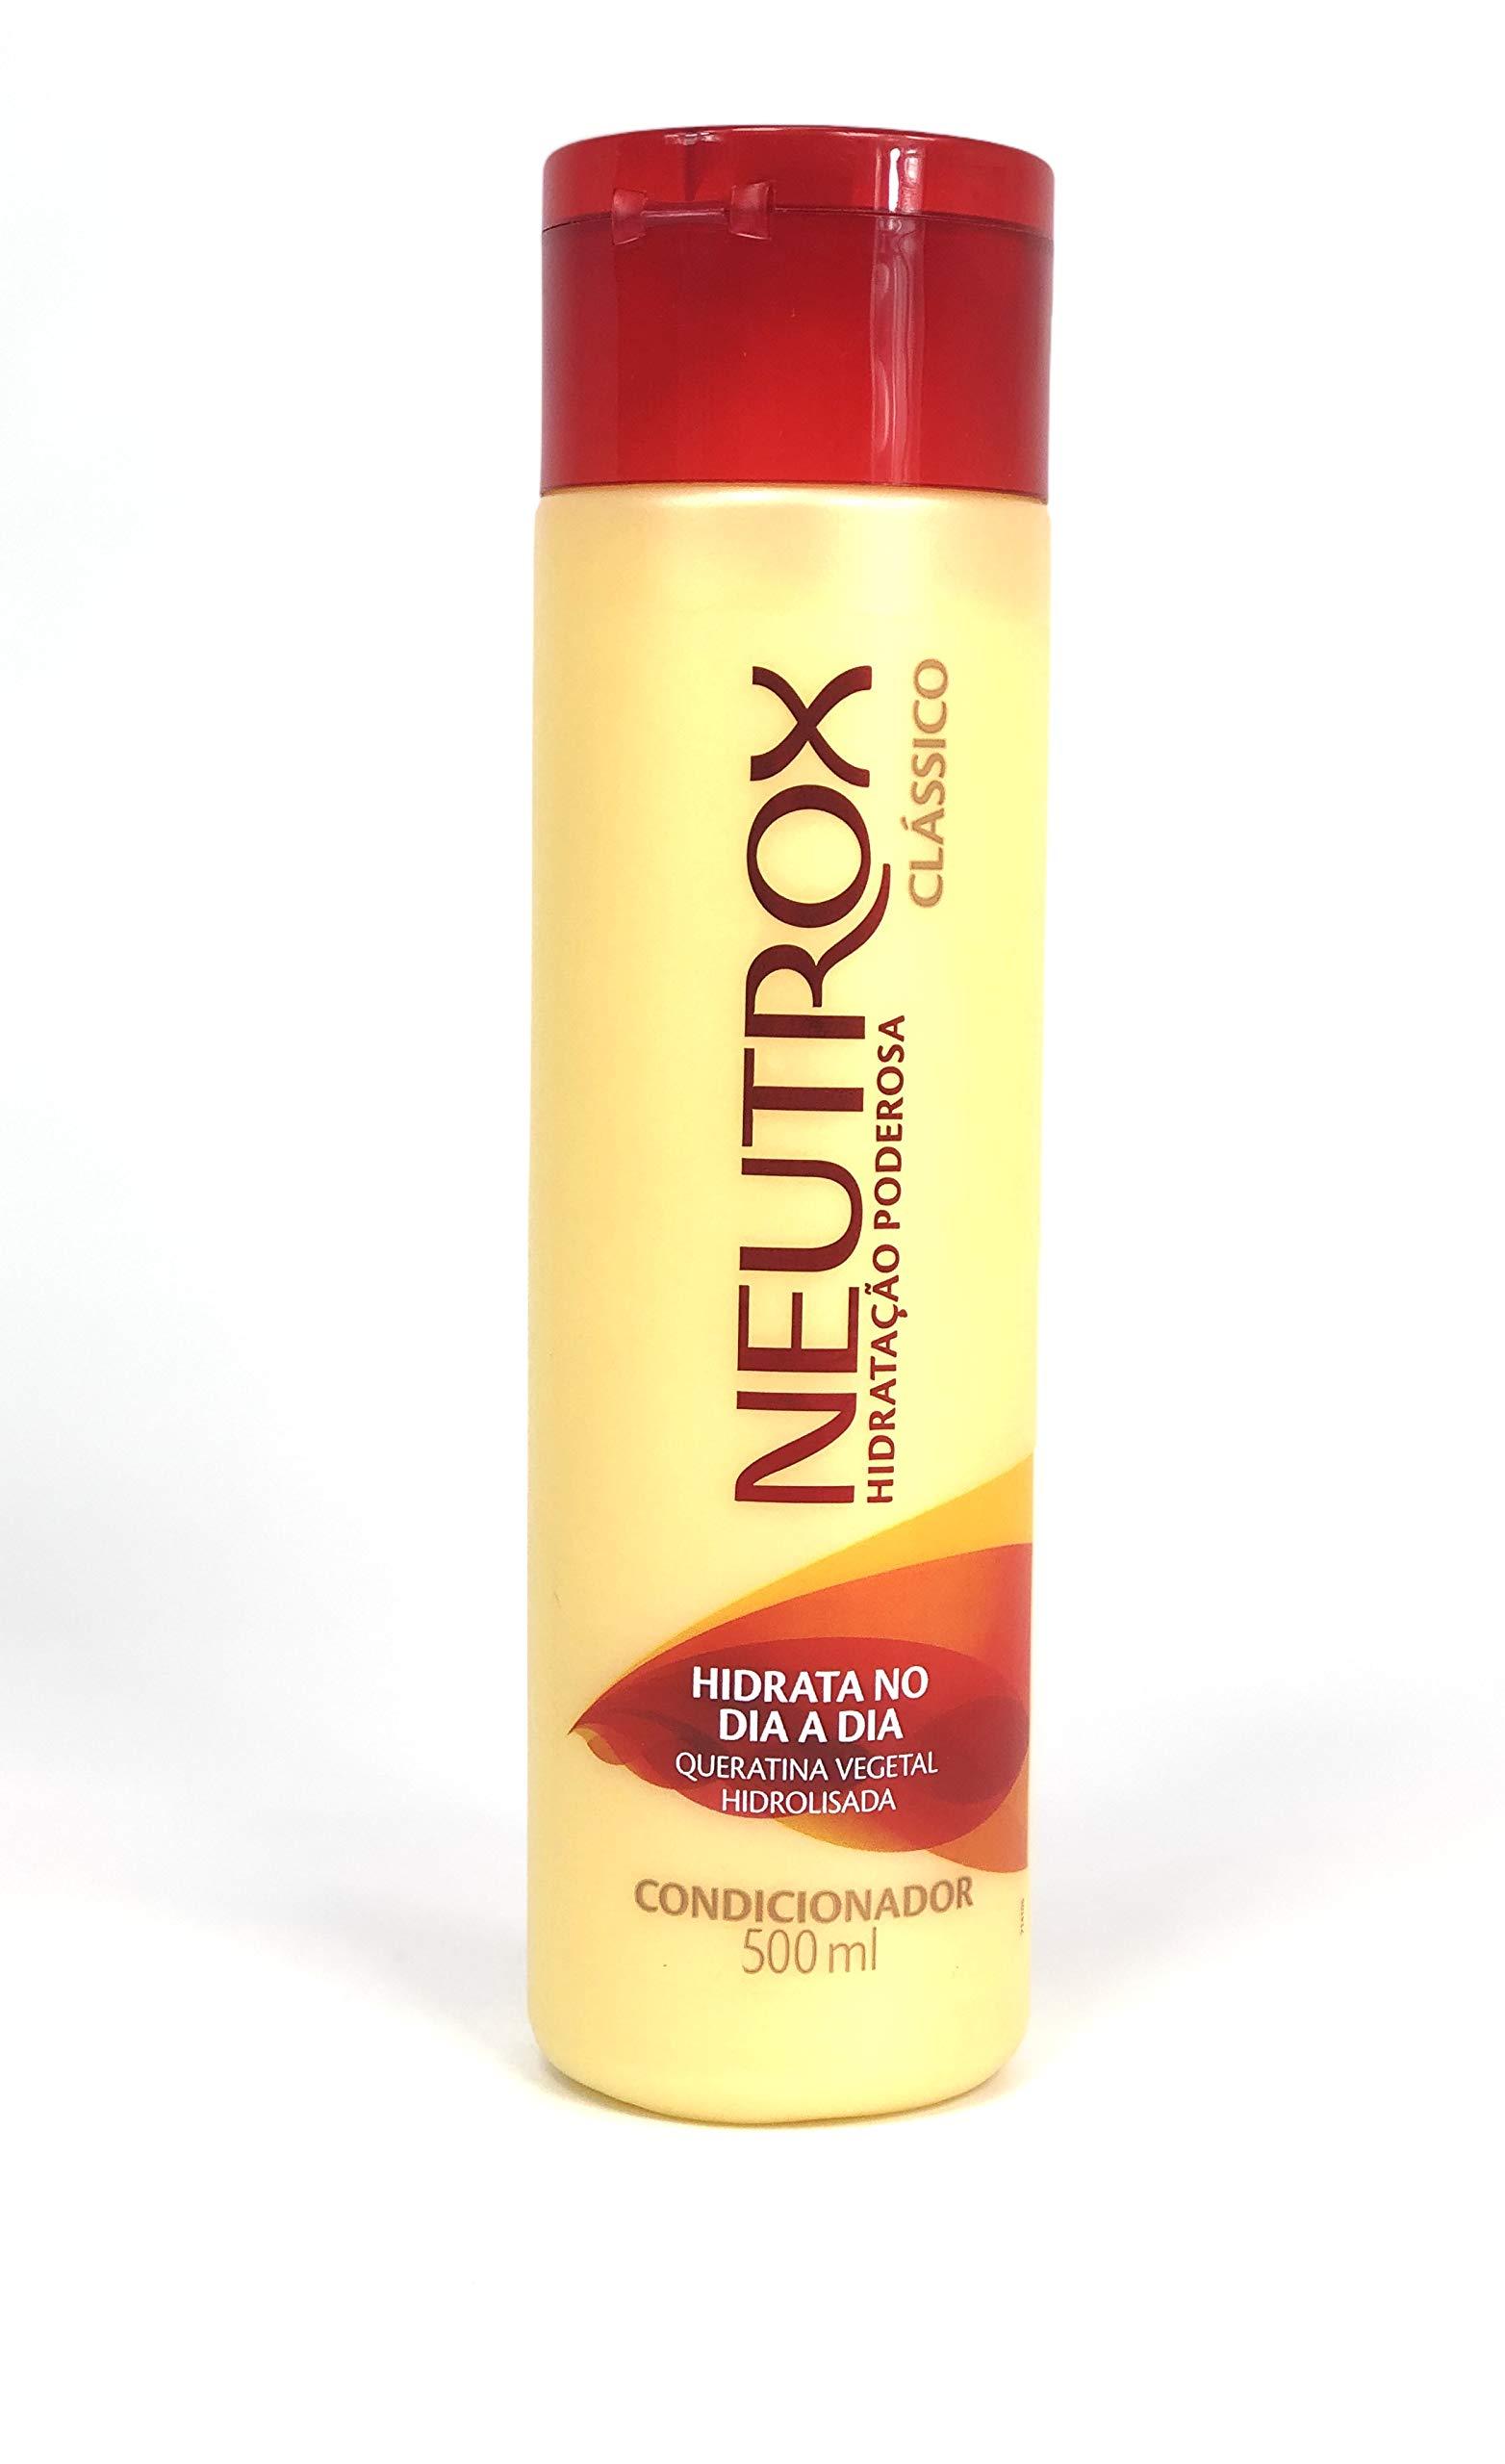 NEUTROX Clássico Condicionador 500ml | Brazilian Hair Treatment Neutrox - All Hair Types Conditioner Hydrolized Classic With Keratin 18oz Factory Sealed